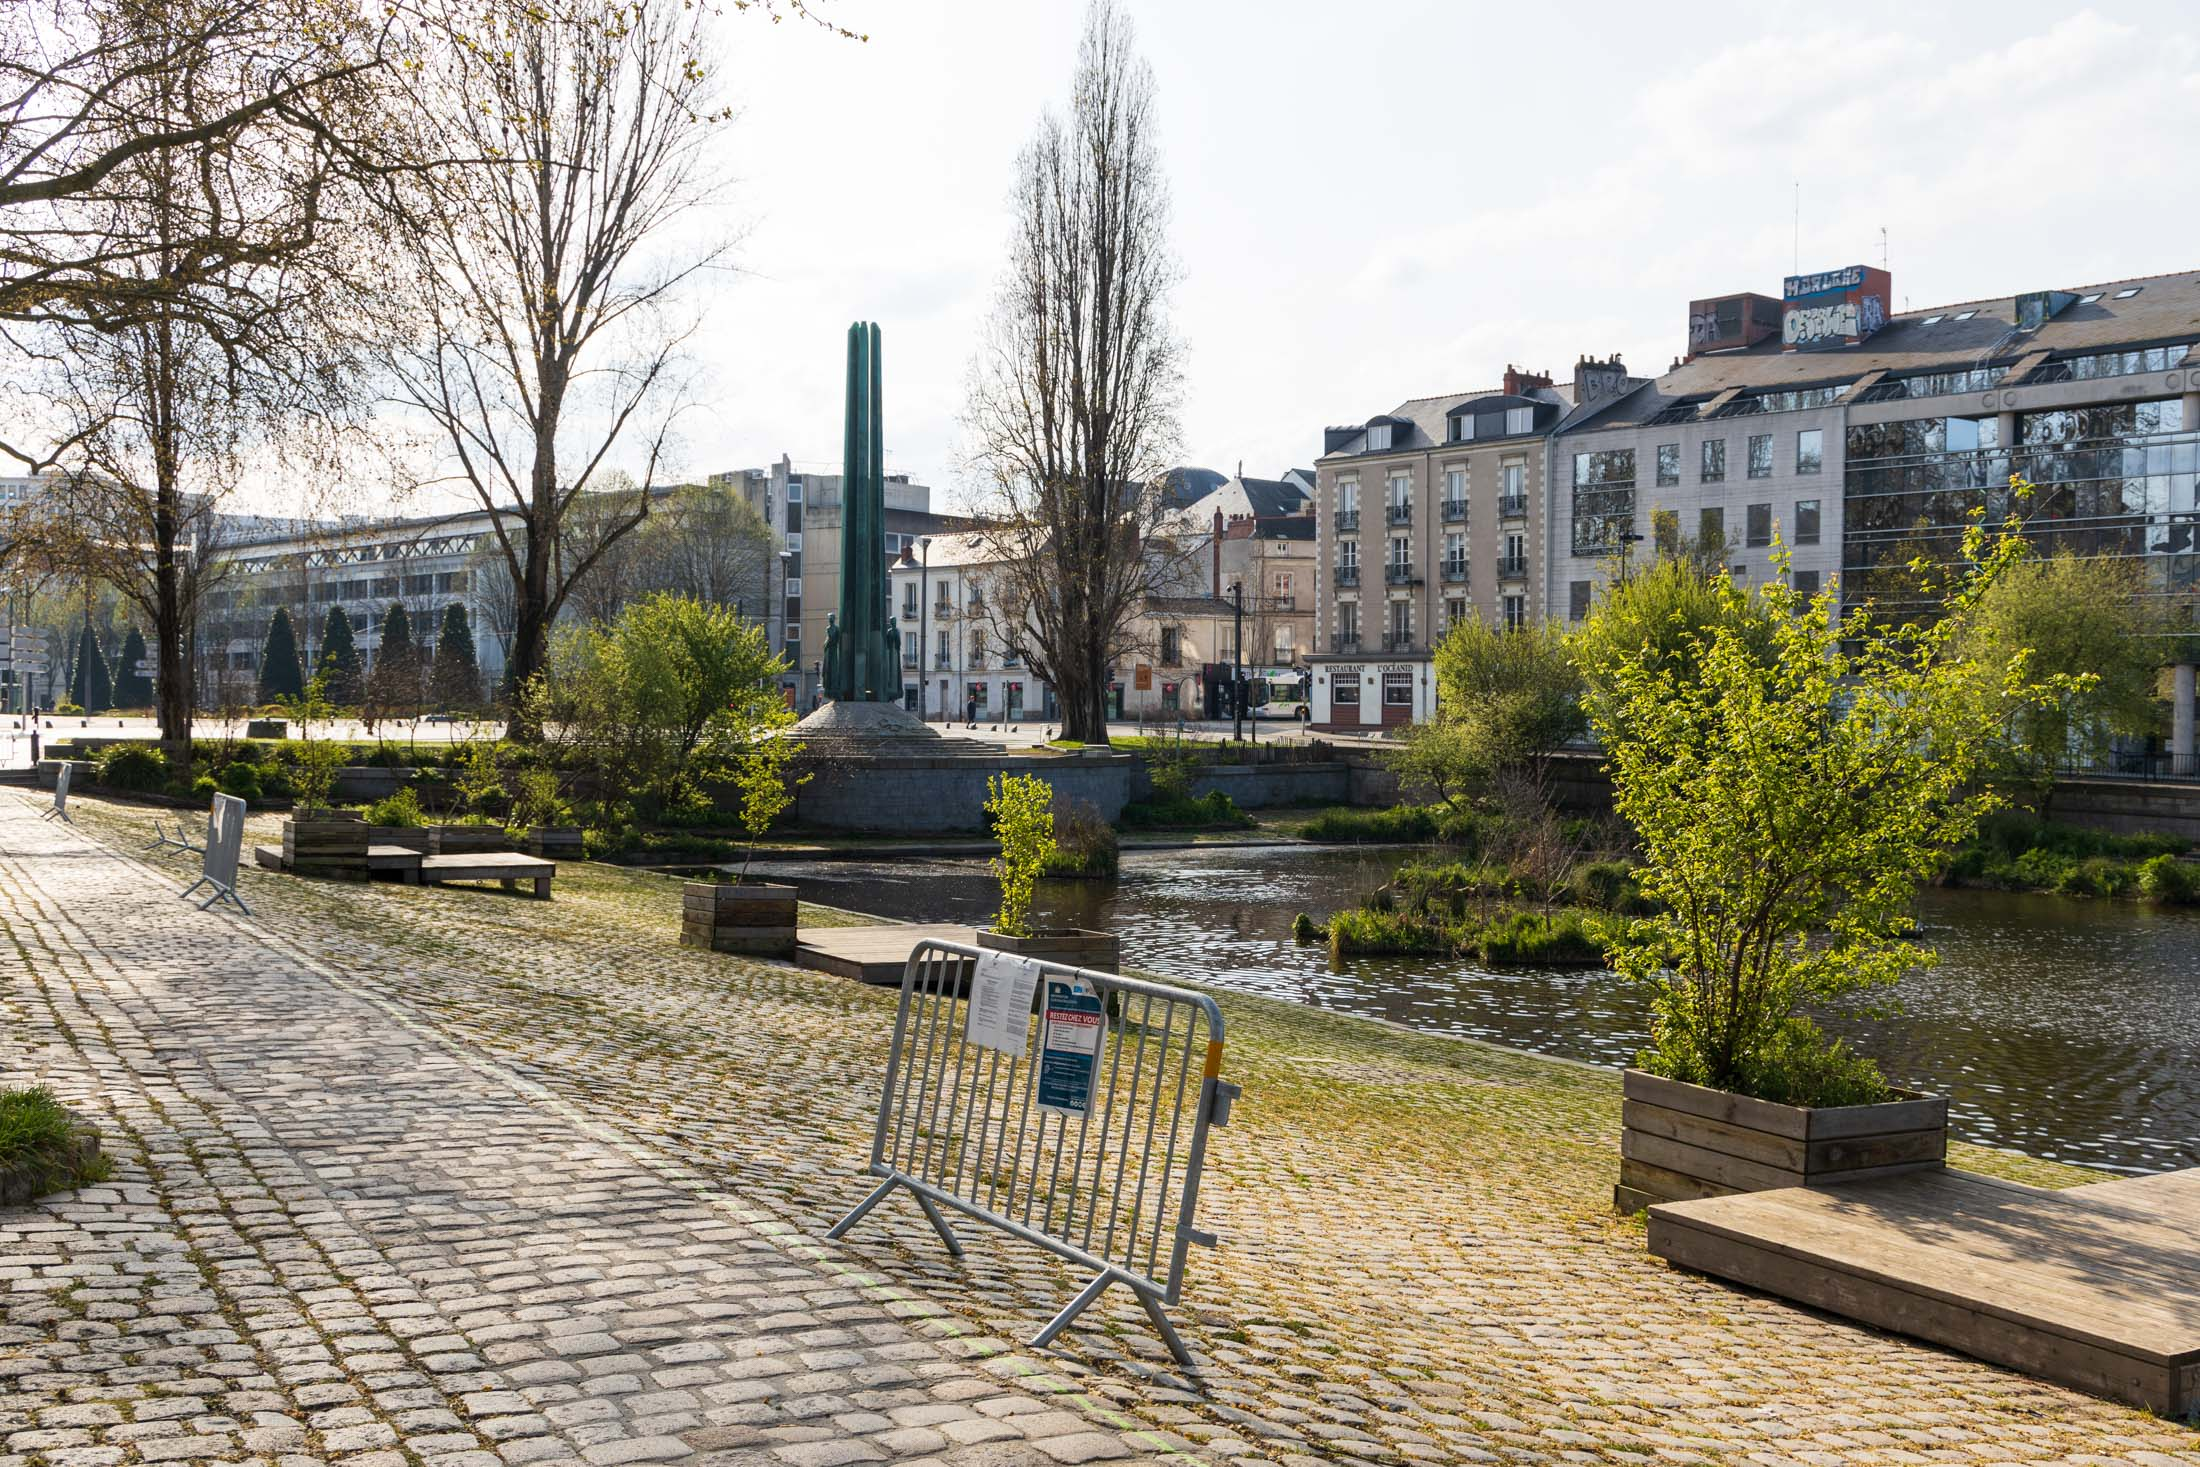 Docks of Erdre river are prohibited. Nantes, France - March 23th 2020.Les quais de l'Erdre sont interdits. Nantes, France - 23 mars 2020.